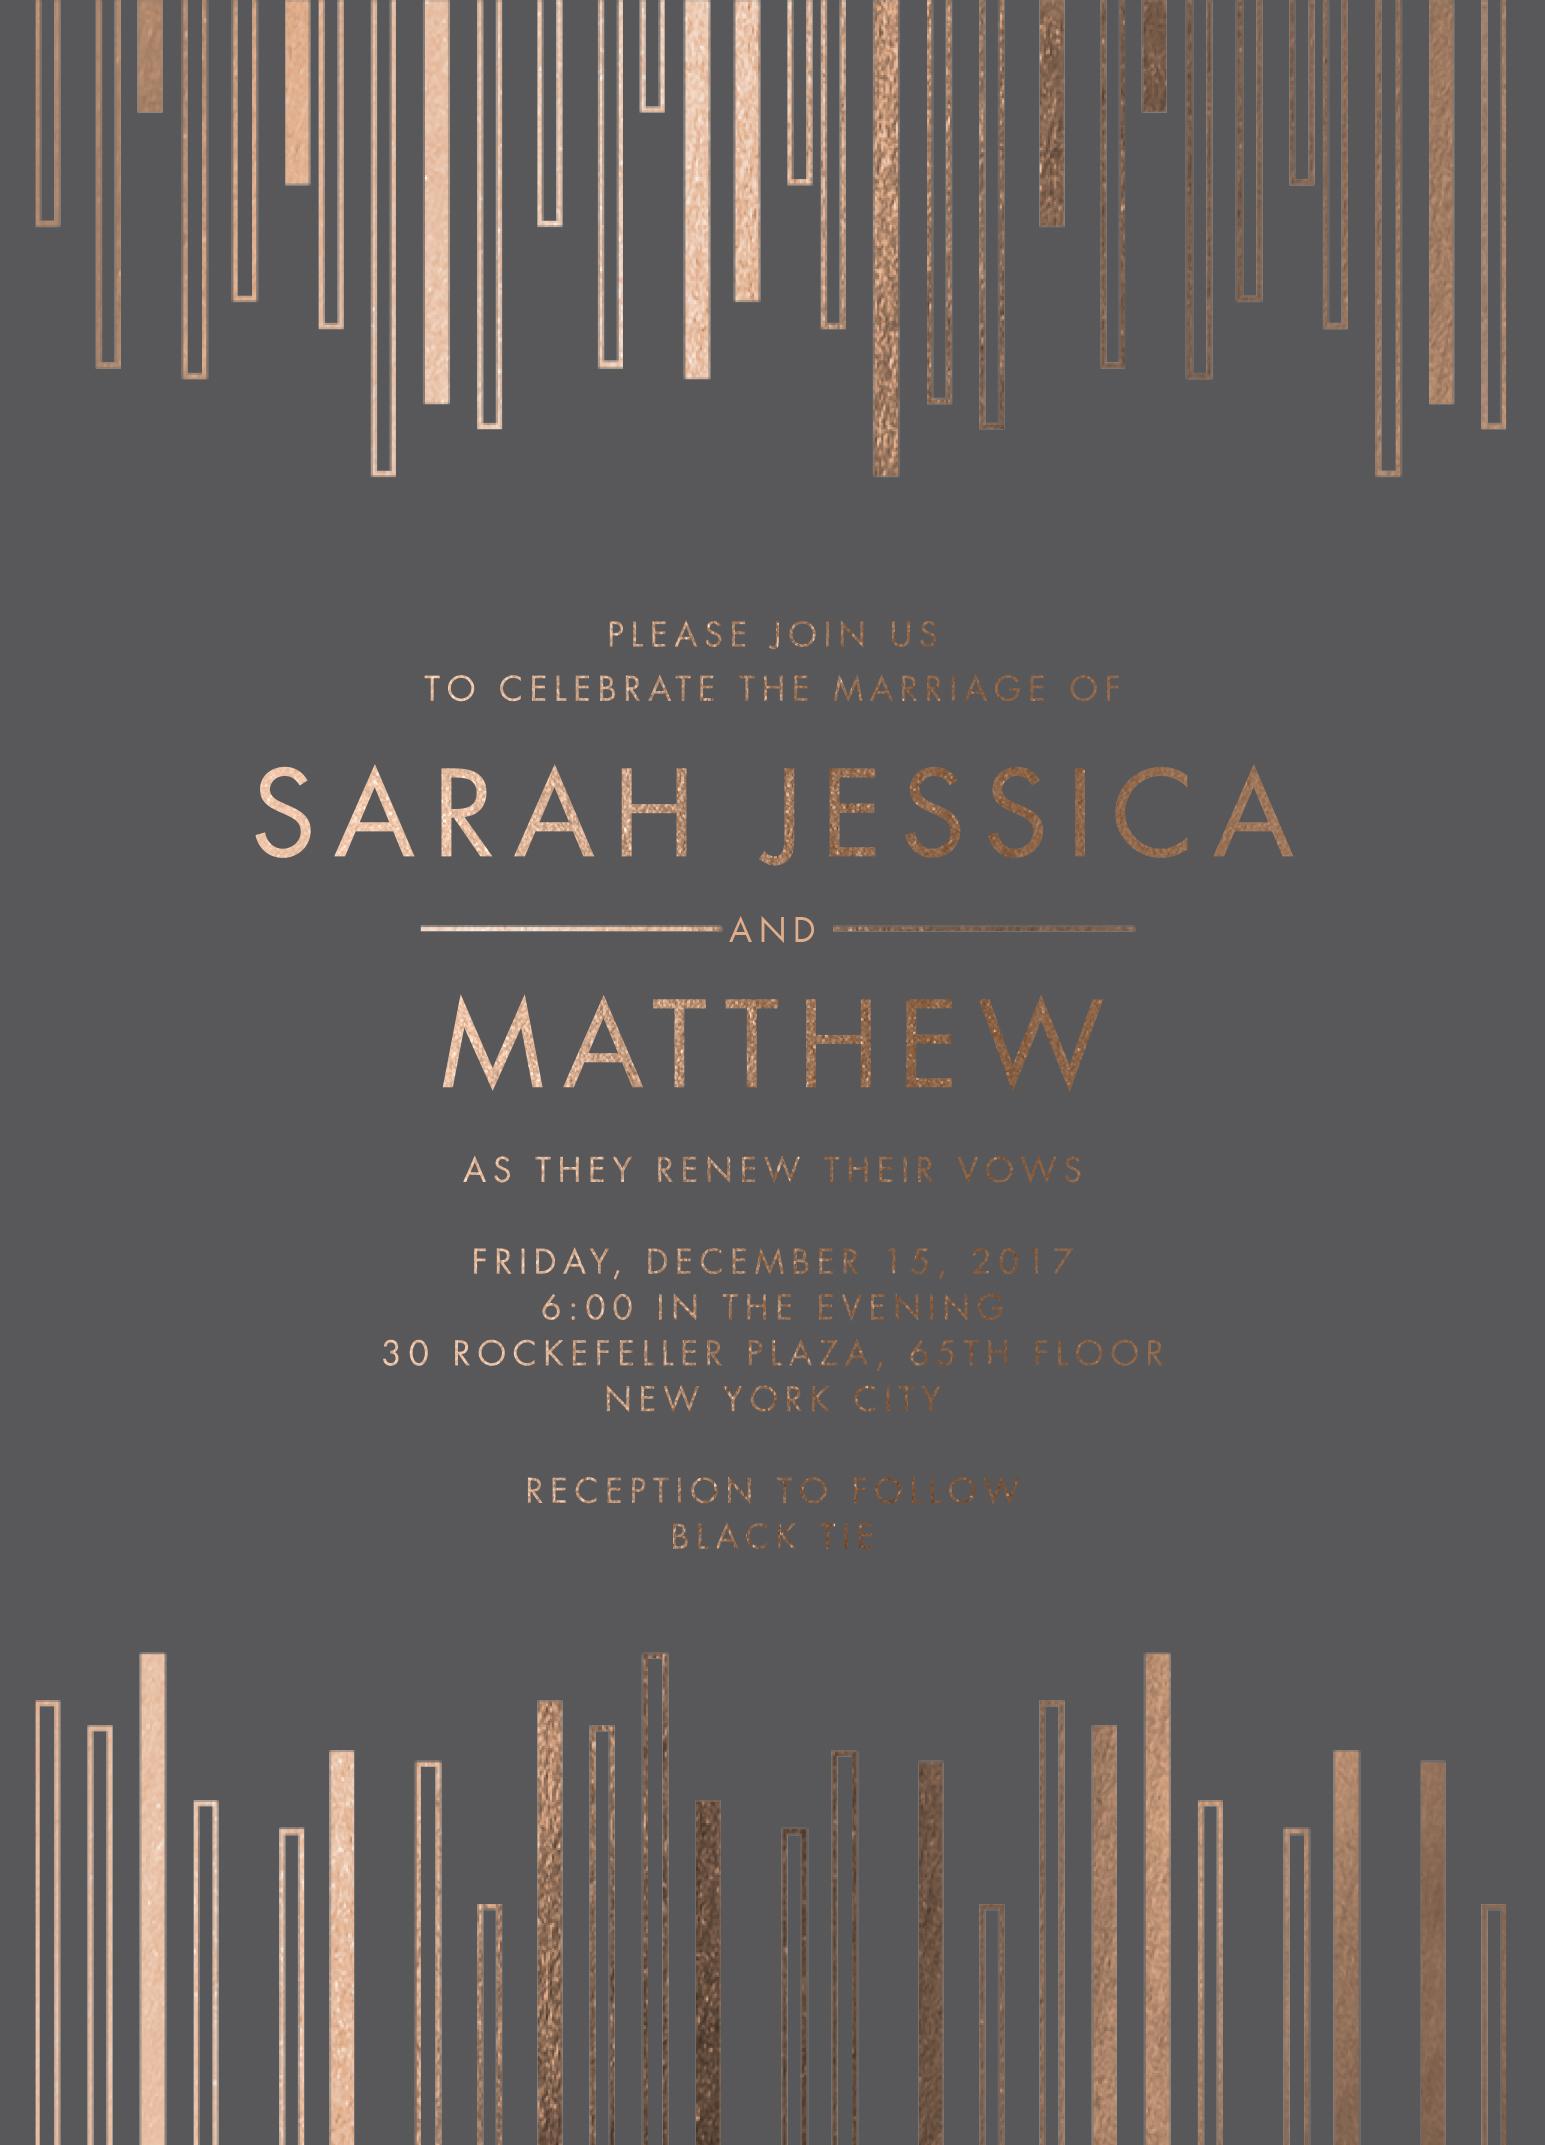 Sarah Jessica Parker and Matthew Broderick vow renewal prediction mindy weiss wedding paper divas